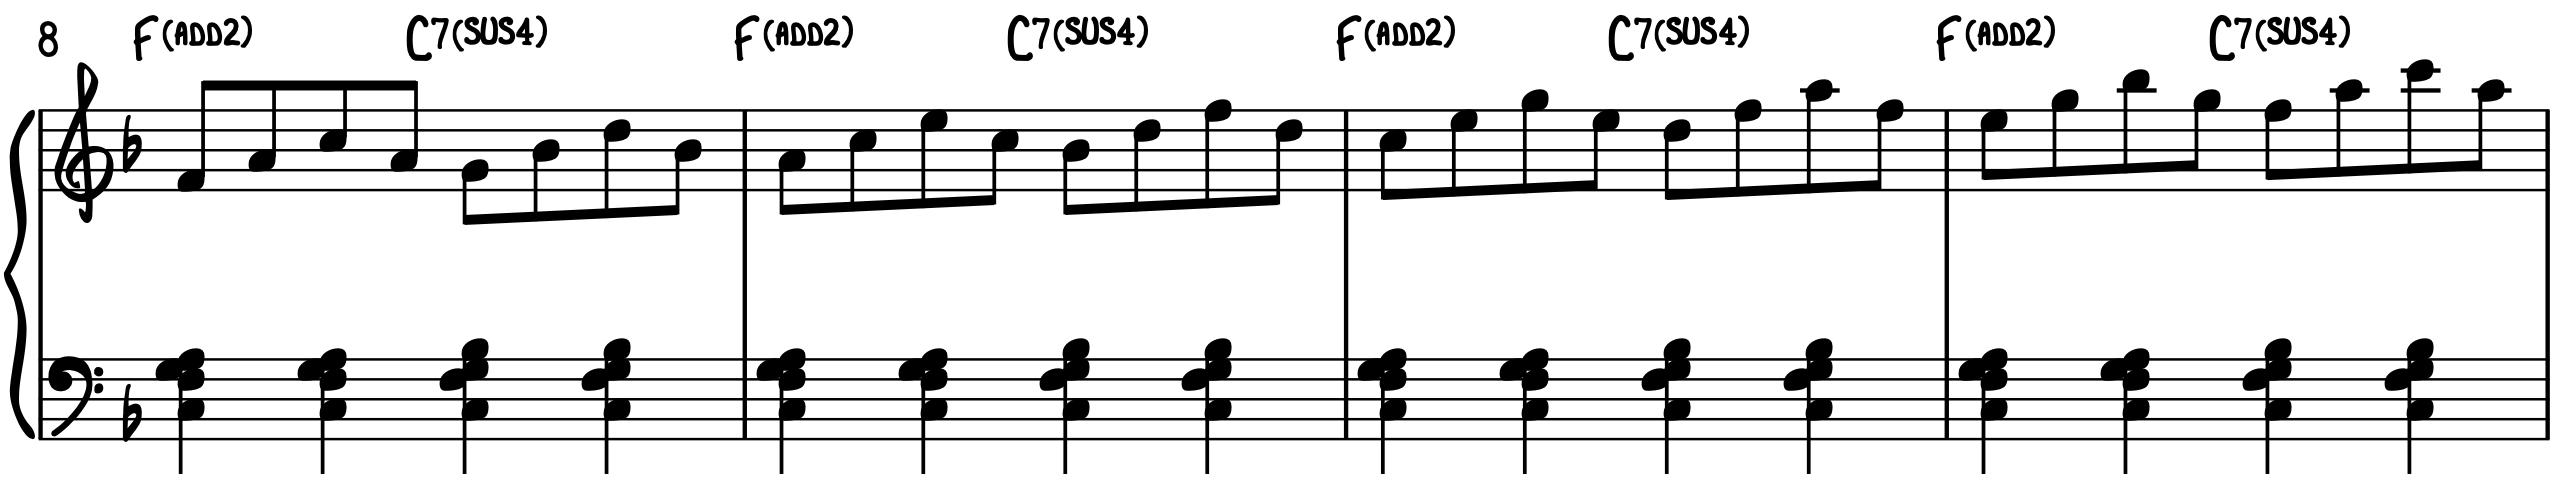 #2 Triad Skip Technique